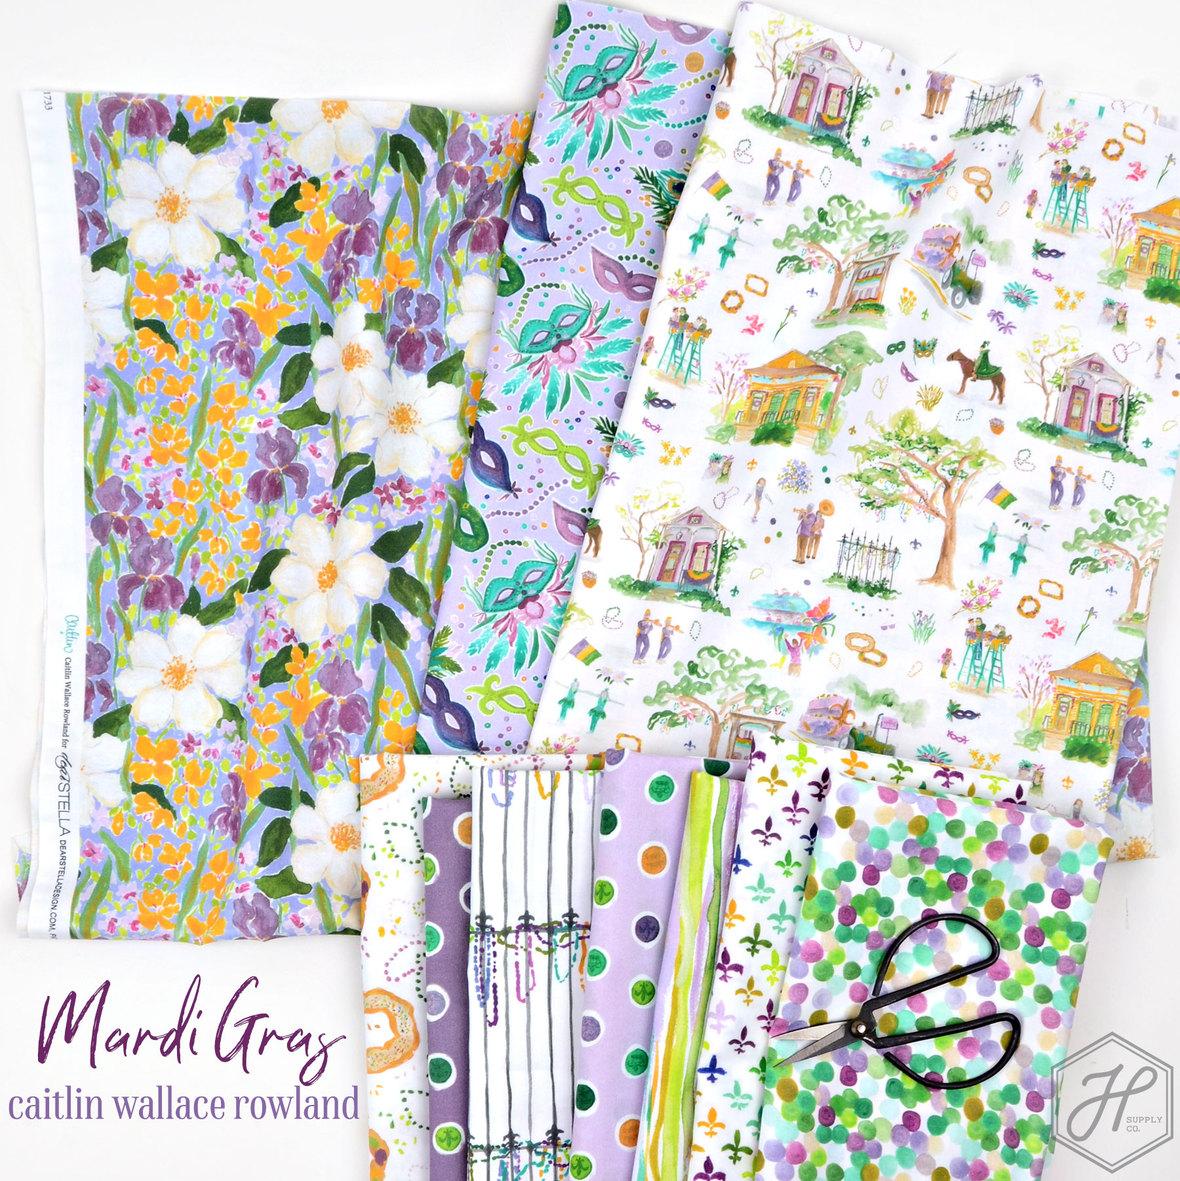 Mardi-Gras-Caitlin-Wallace-Rowland-for-Dear-Stella-at-Hawthorne-Supply-Co